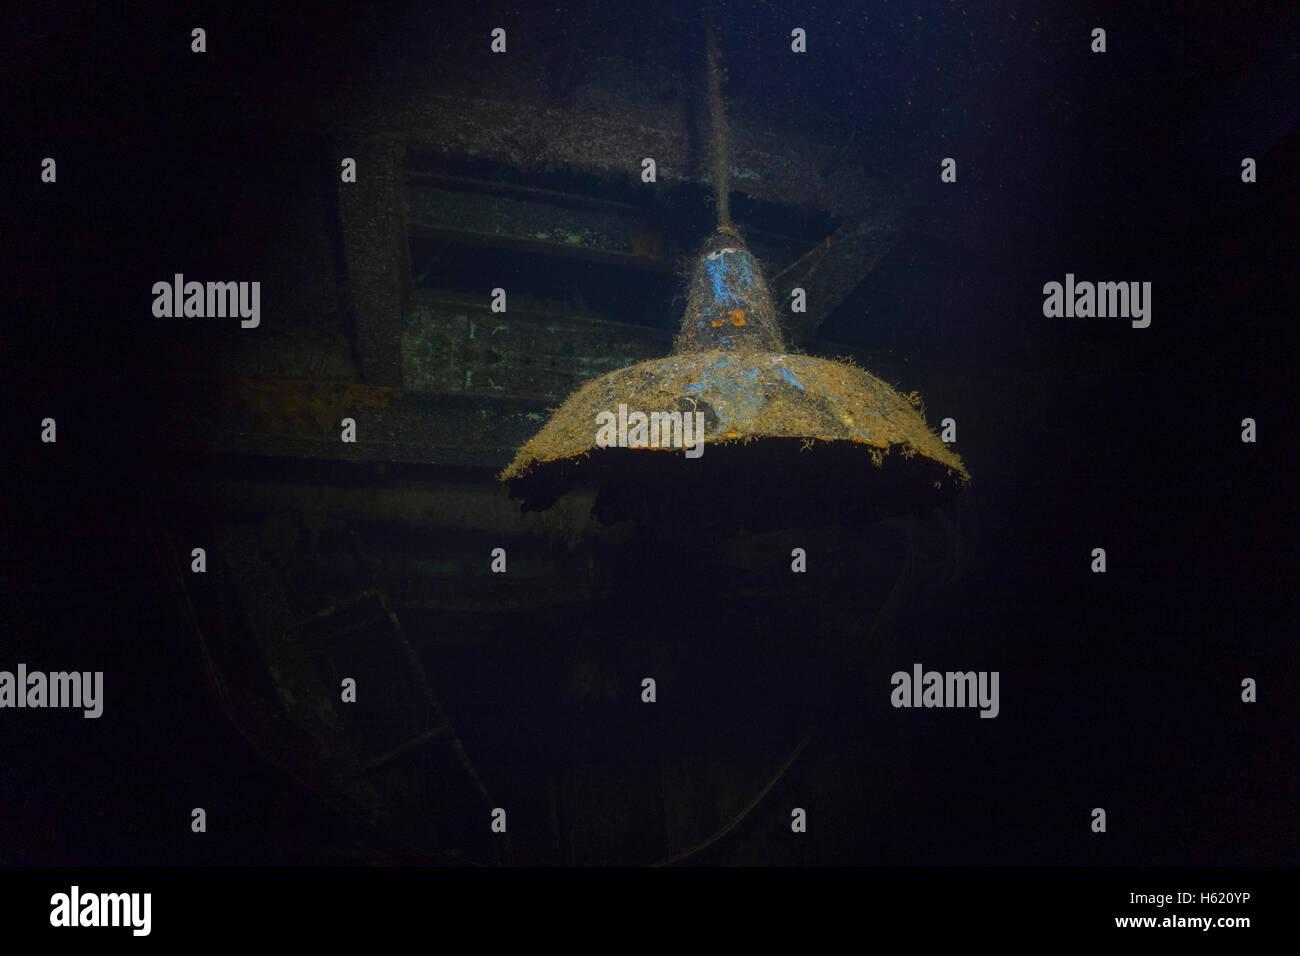 Lamp of a underwater ship wreck, Malta, Mediterranean Sea. - Stock Image